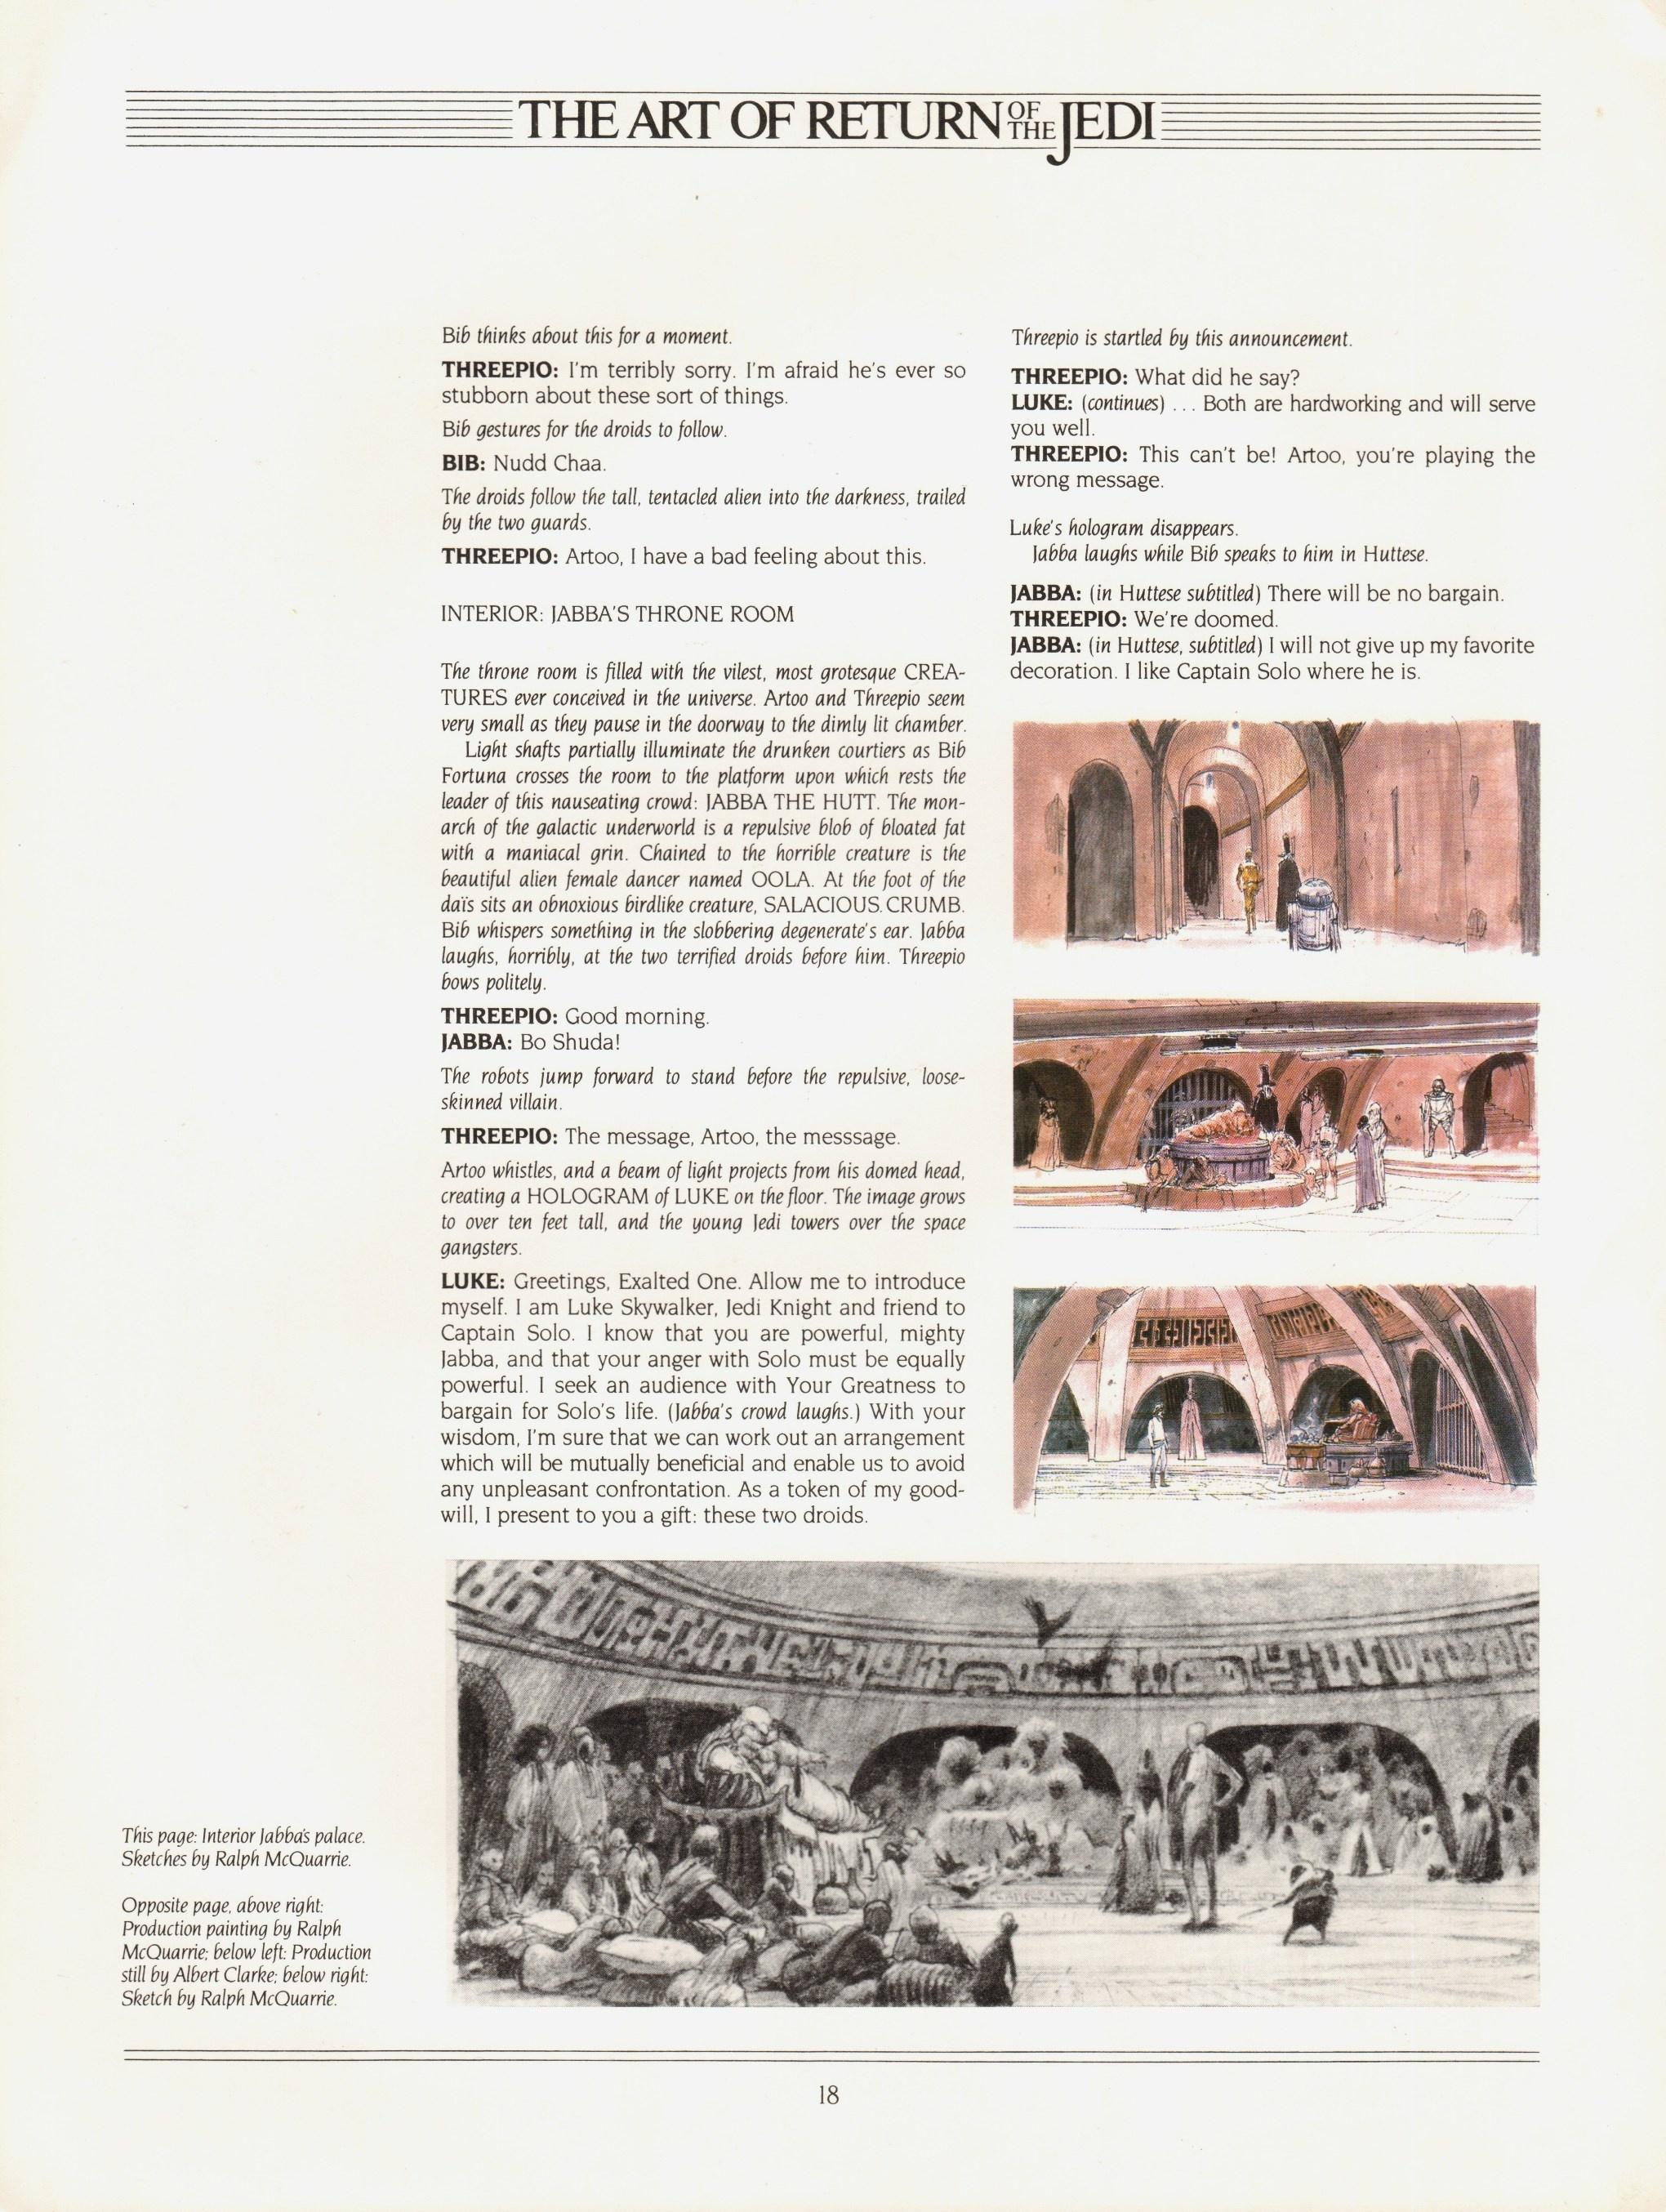 Art of Return of the Jedi (b0bafett_Empire)-p018